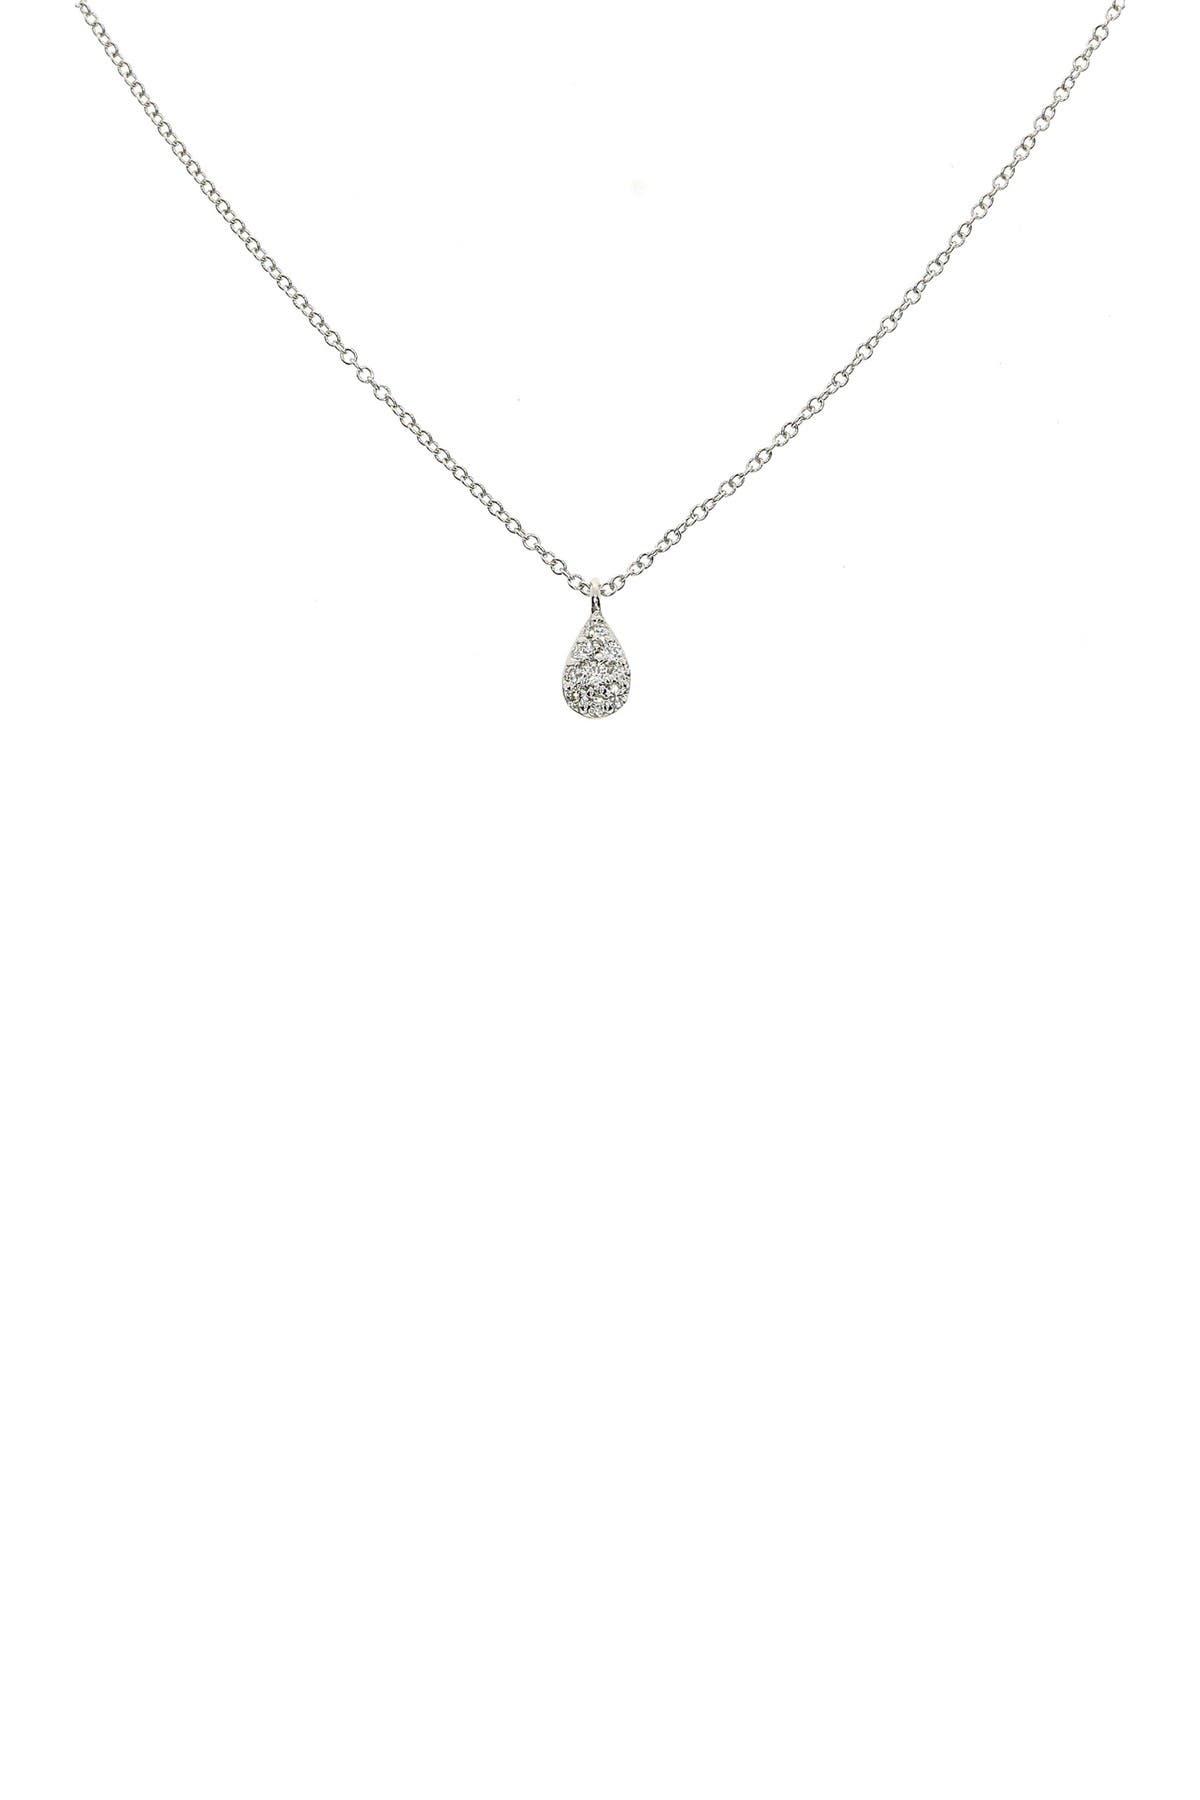 Image of Bony Levy 18K White Gold Pave Diamond Petite Teardrop Pendant Necklace - 0.07 ctw